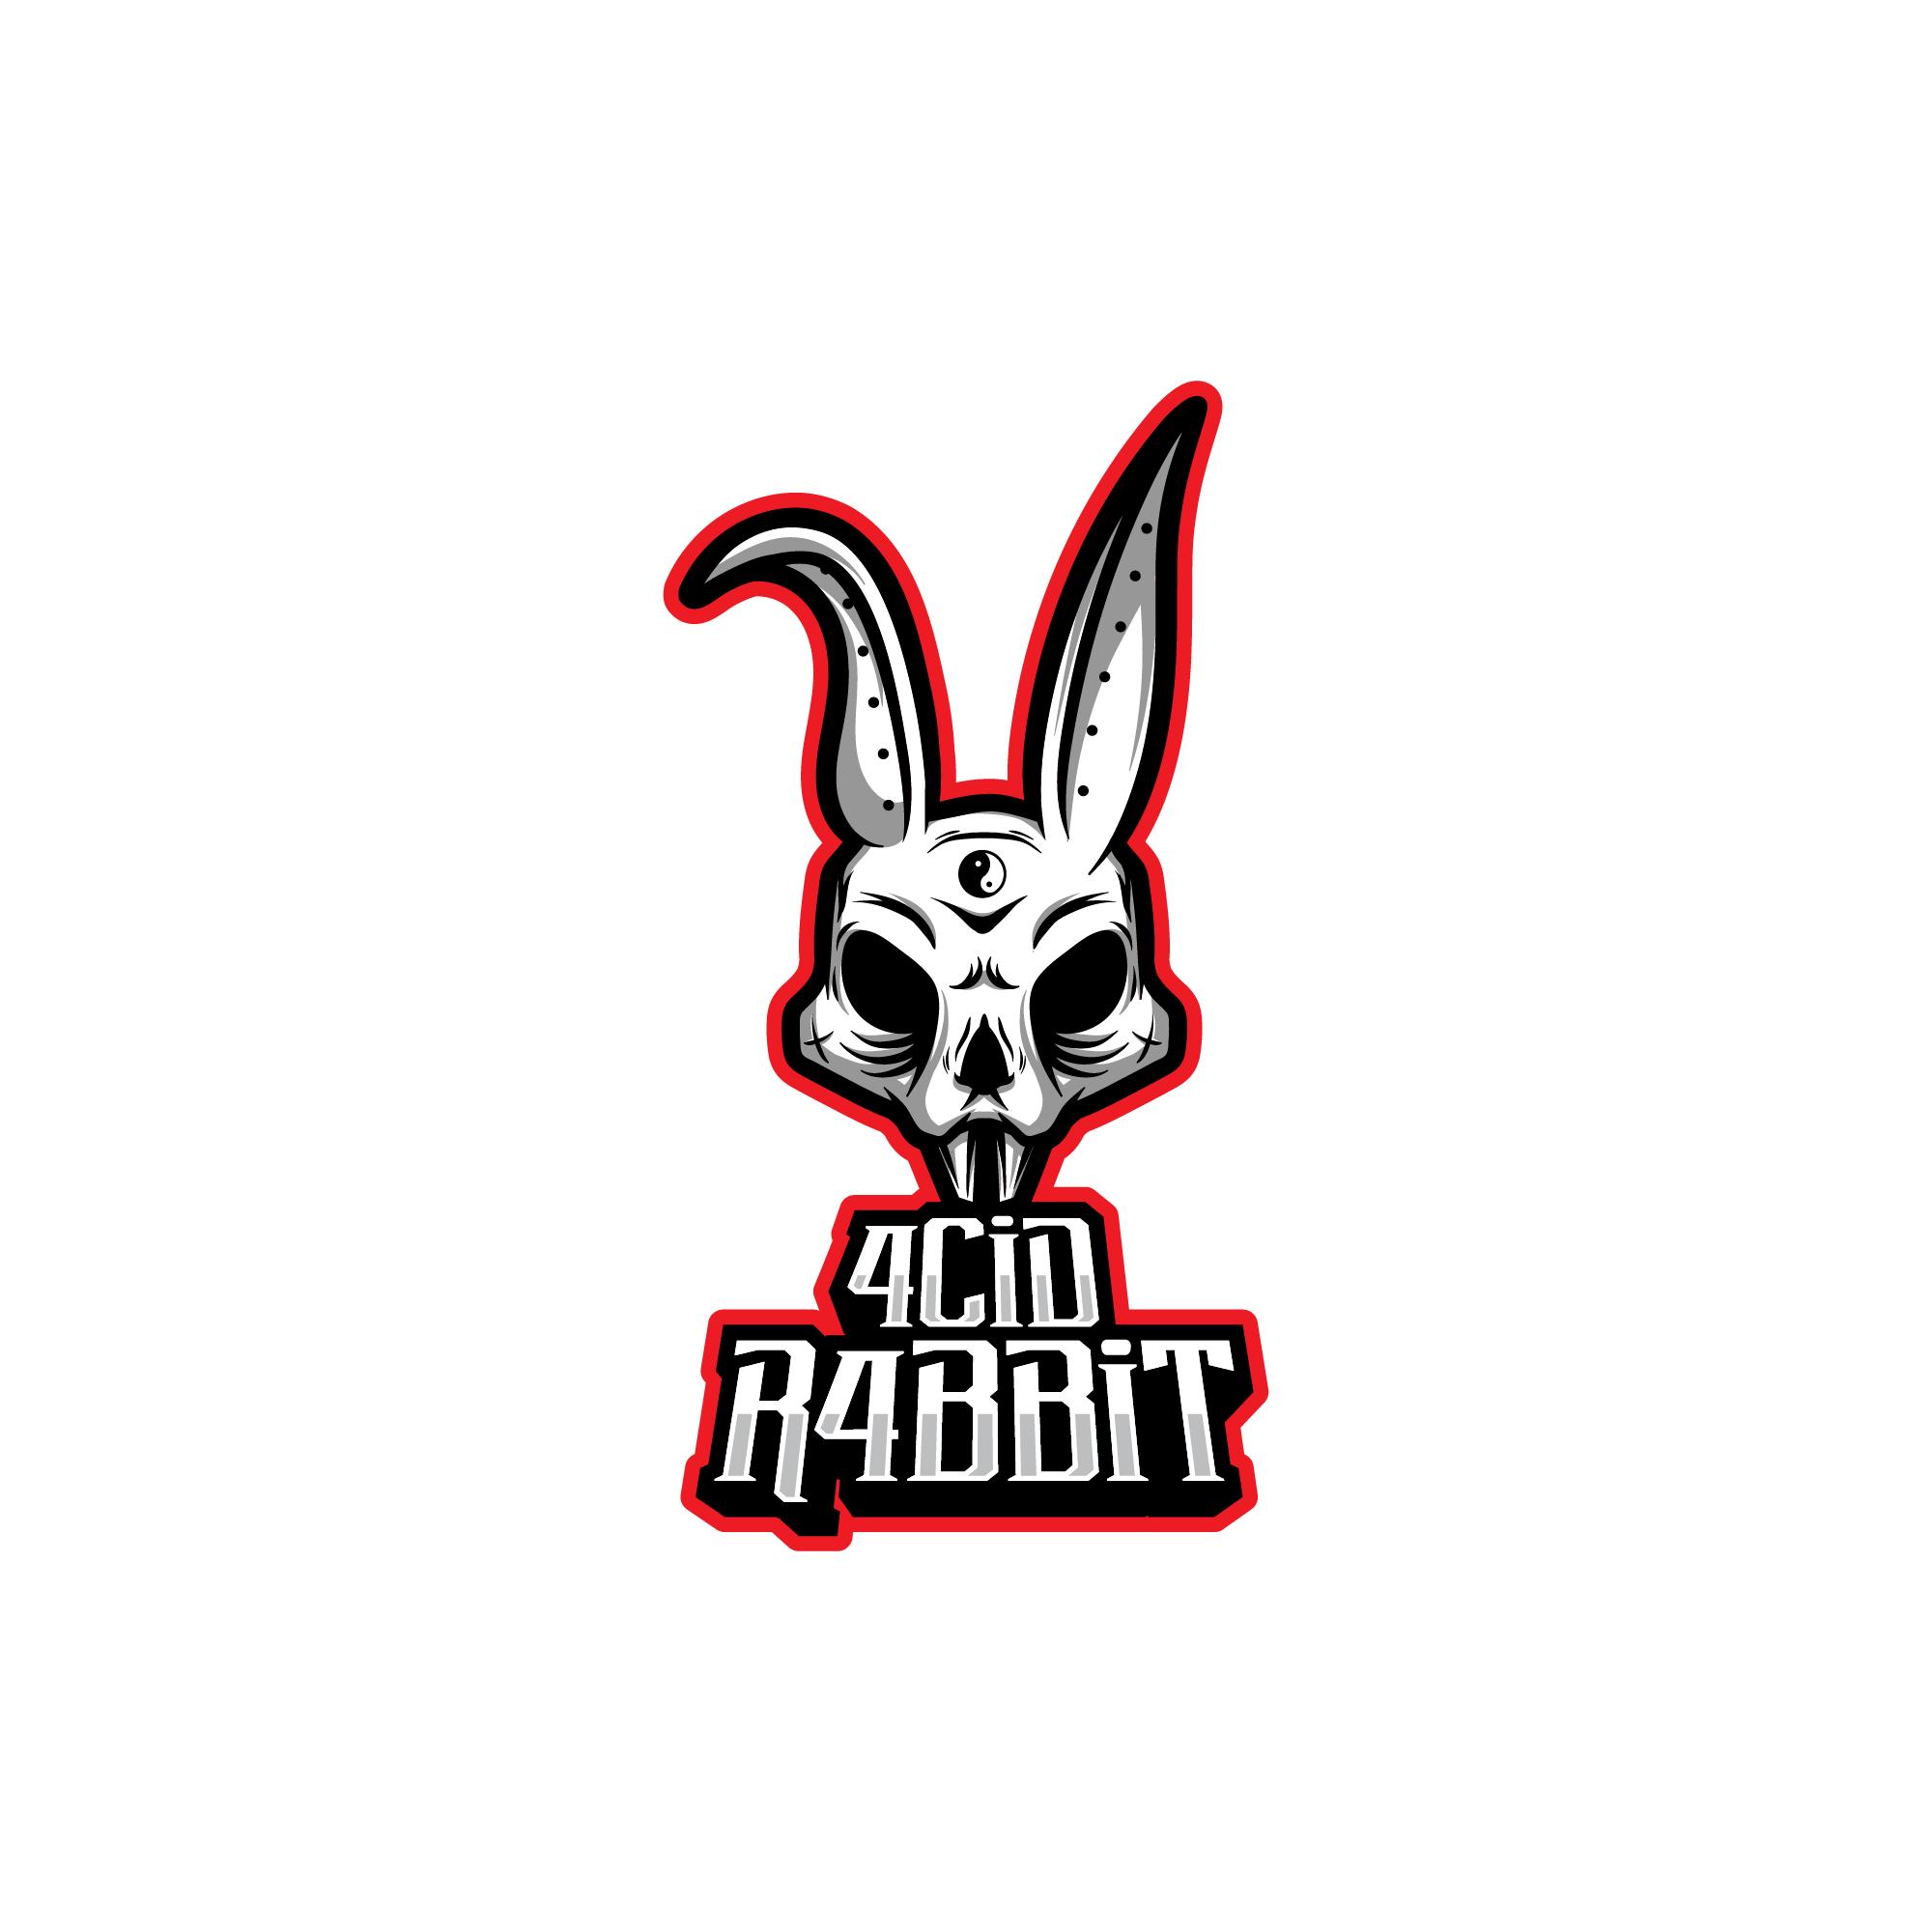 acid rabbit client logo